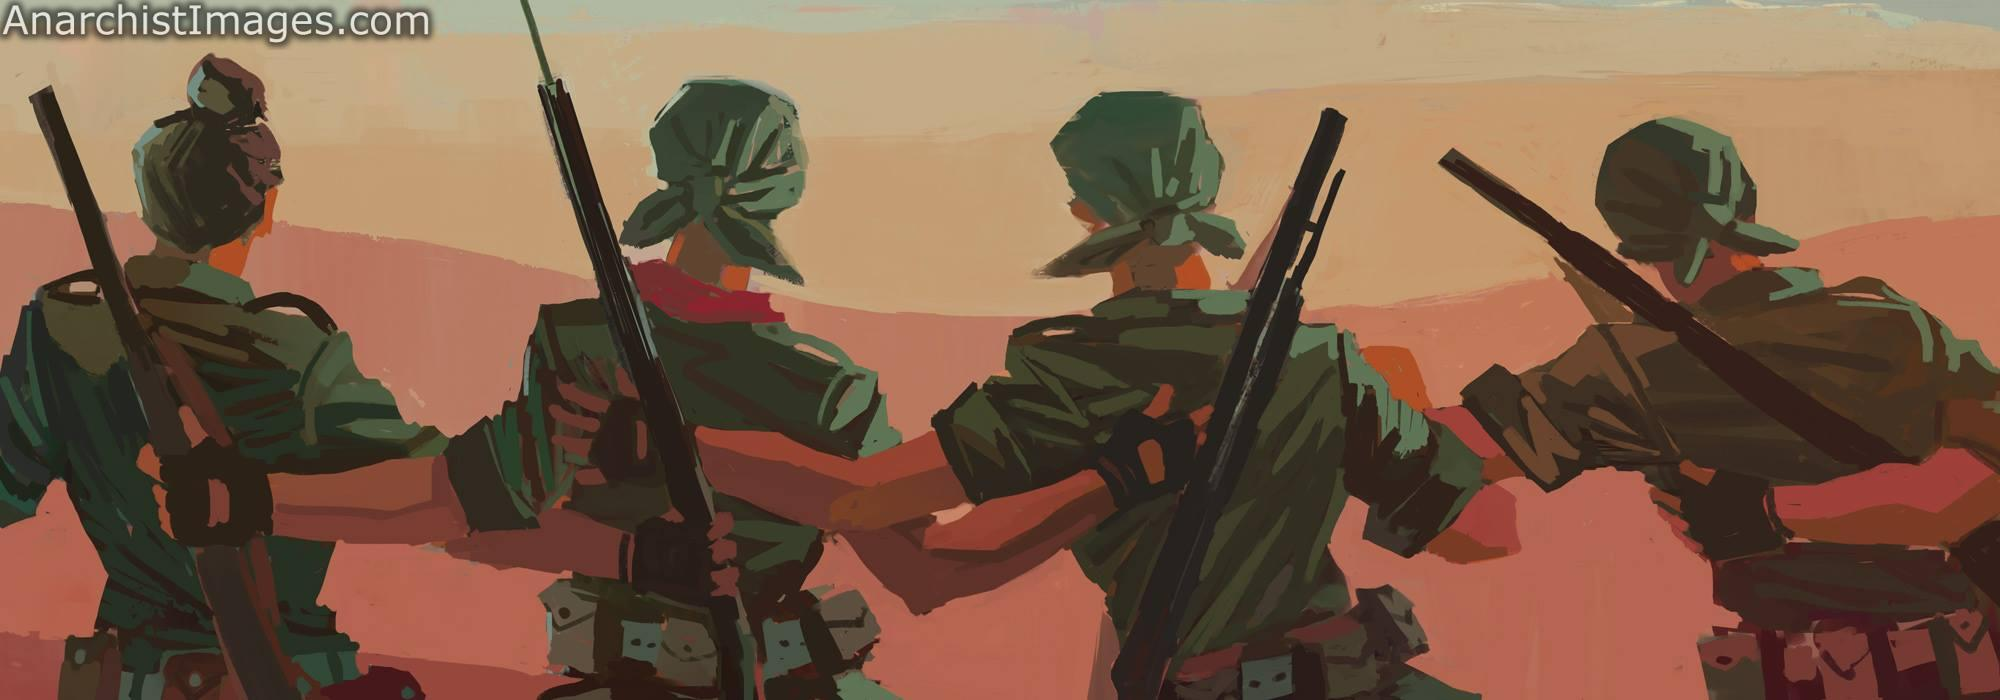 Rojava calling!